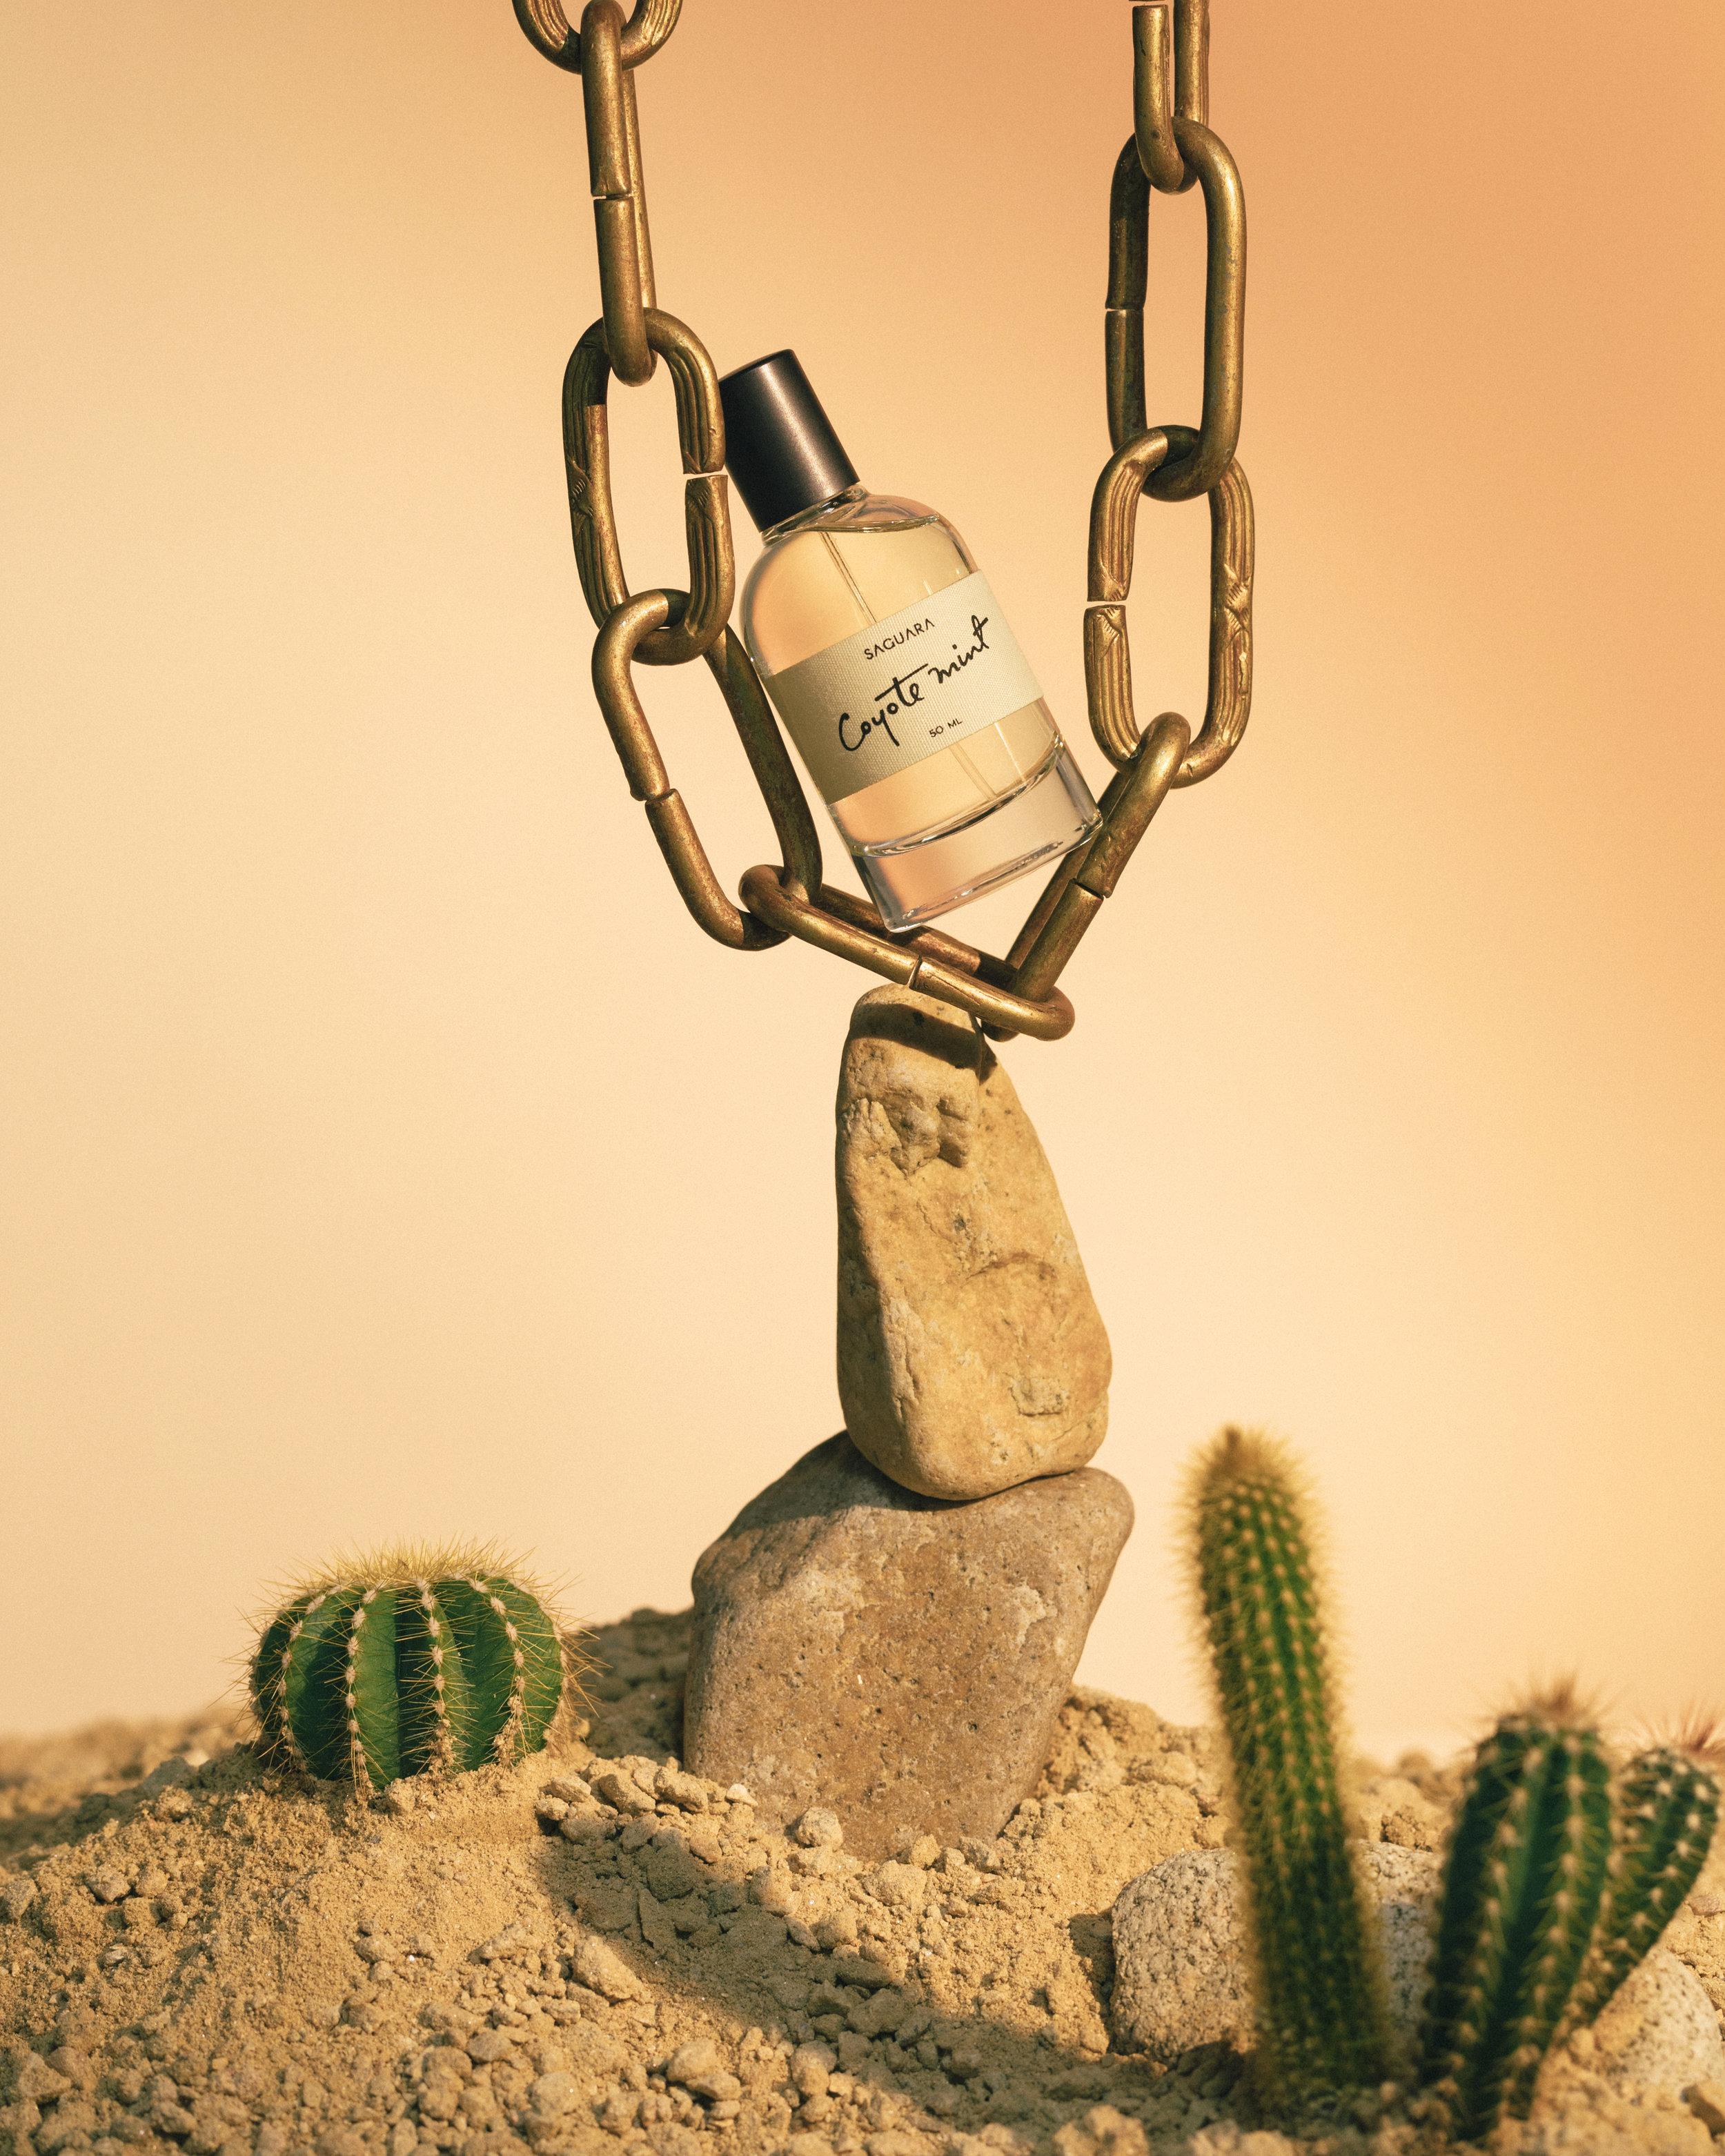 Saguara Perfumes - Coyote Mint